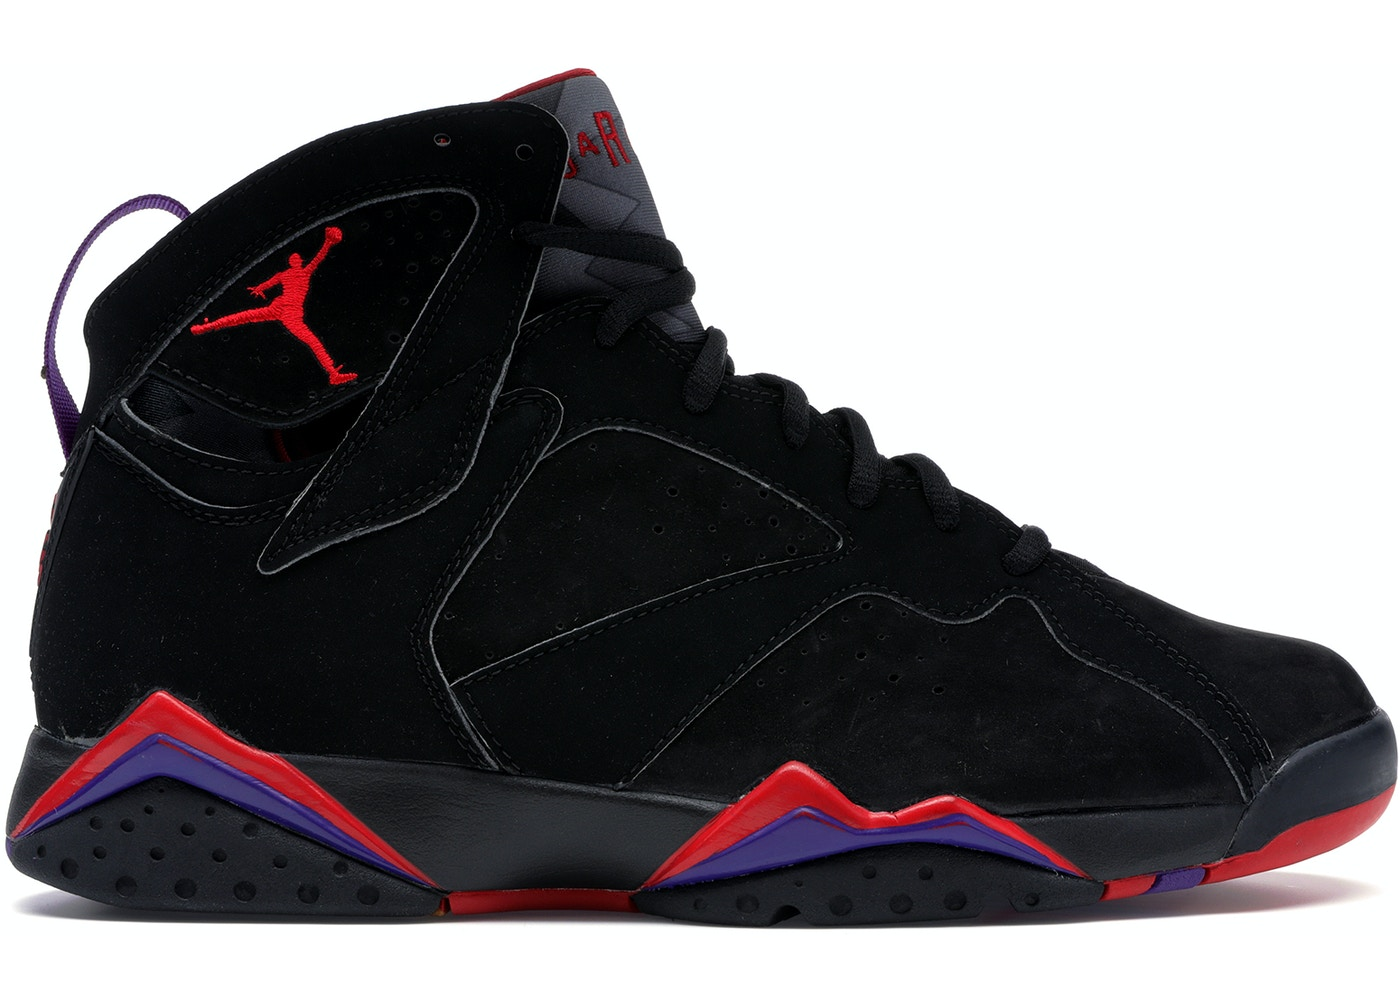 online retailer 5ad14 58fcf Jordan 7 Retro Raptors (2002) - 304775-006